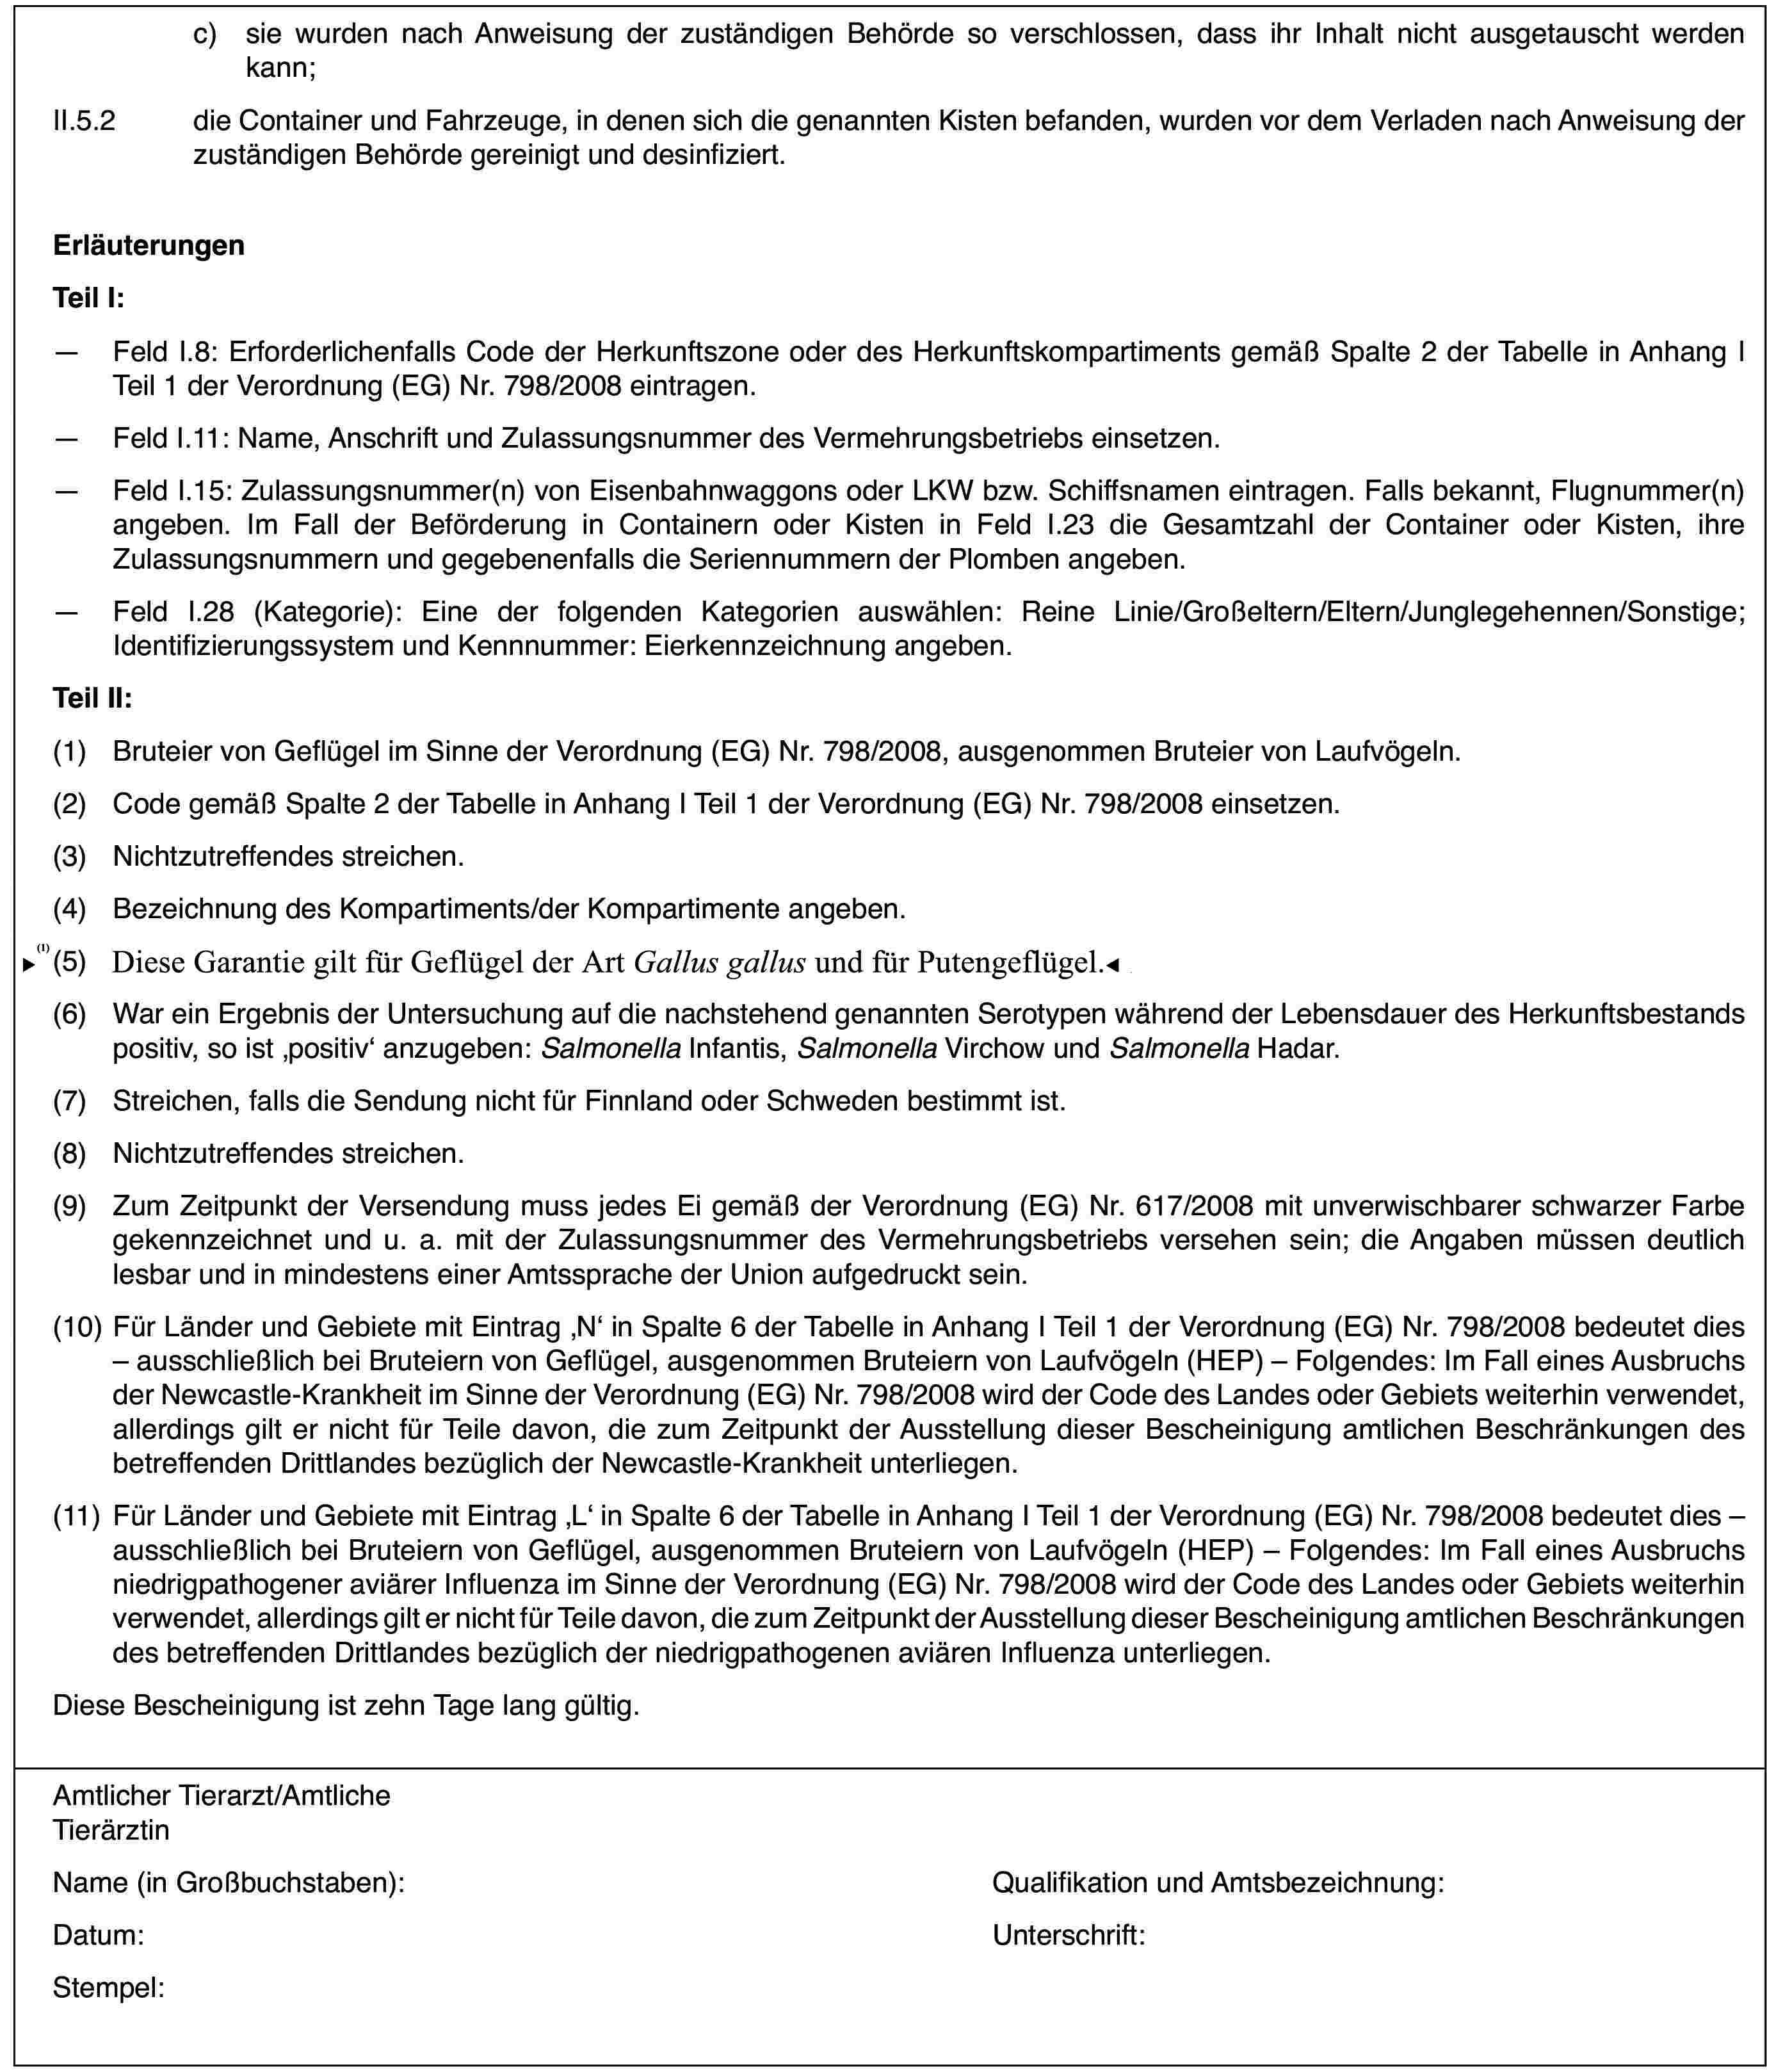 EUR-Lex - 02008R0798-20100413 - EN - EUR-Lex